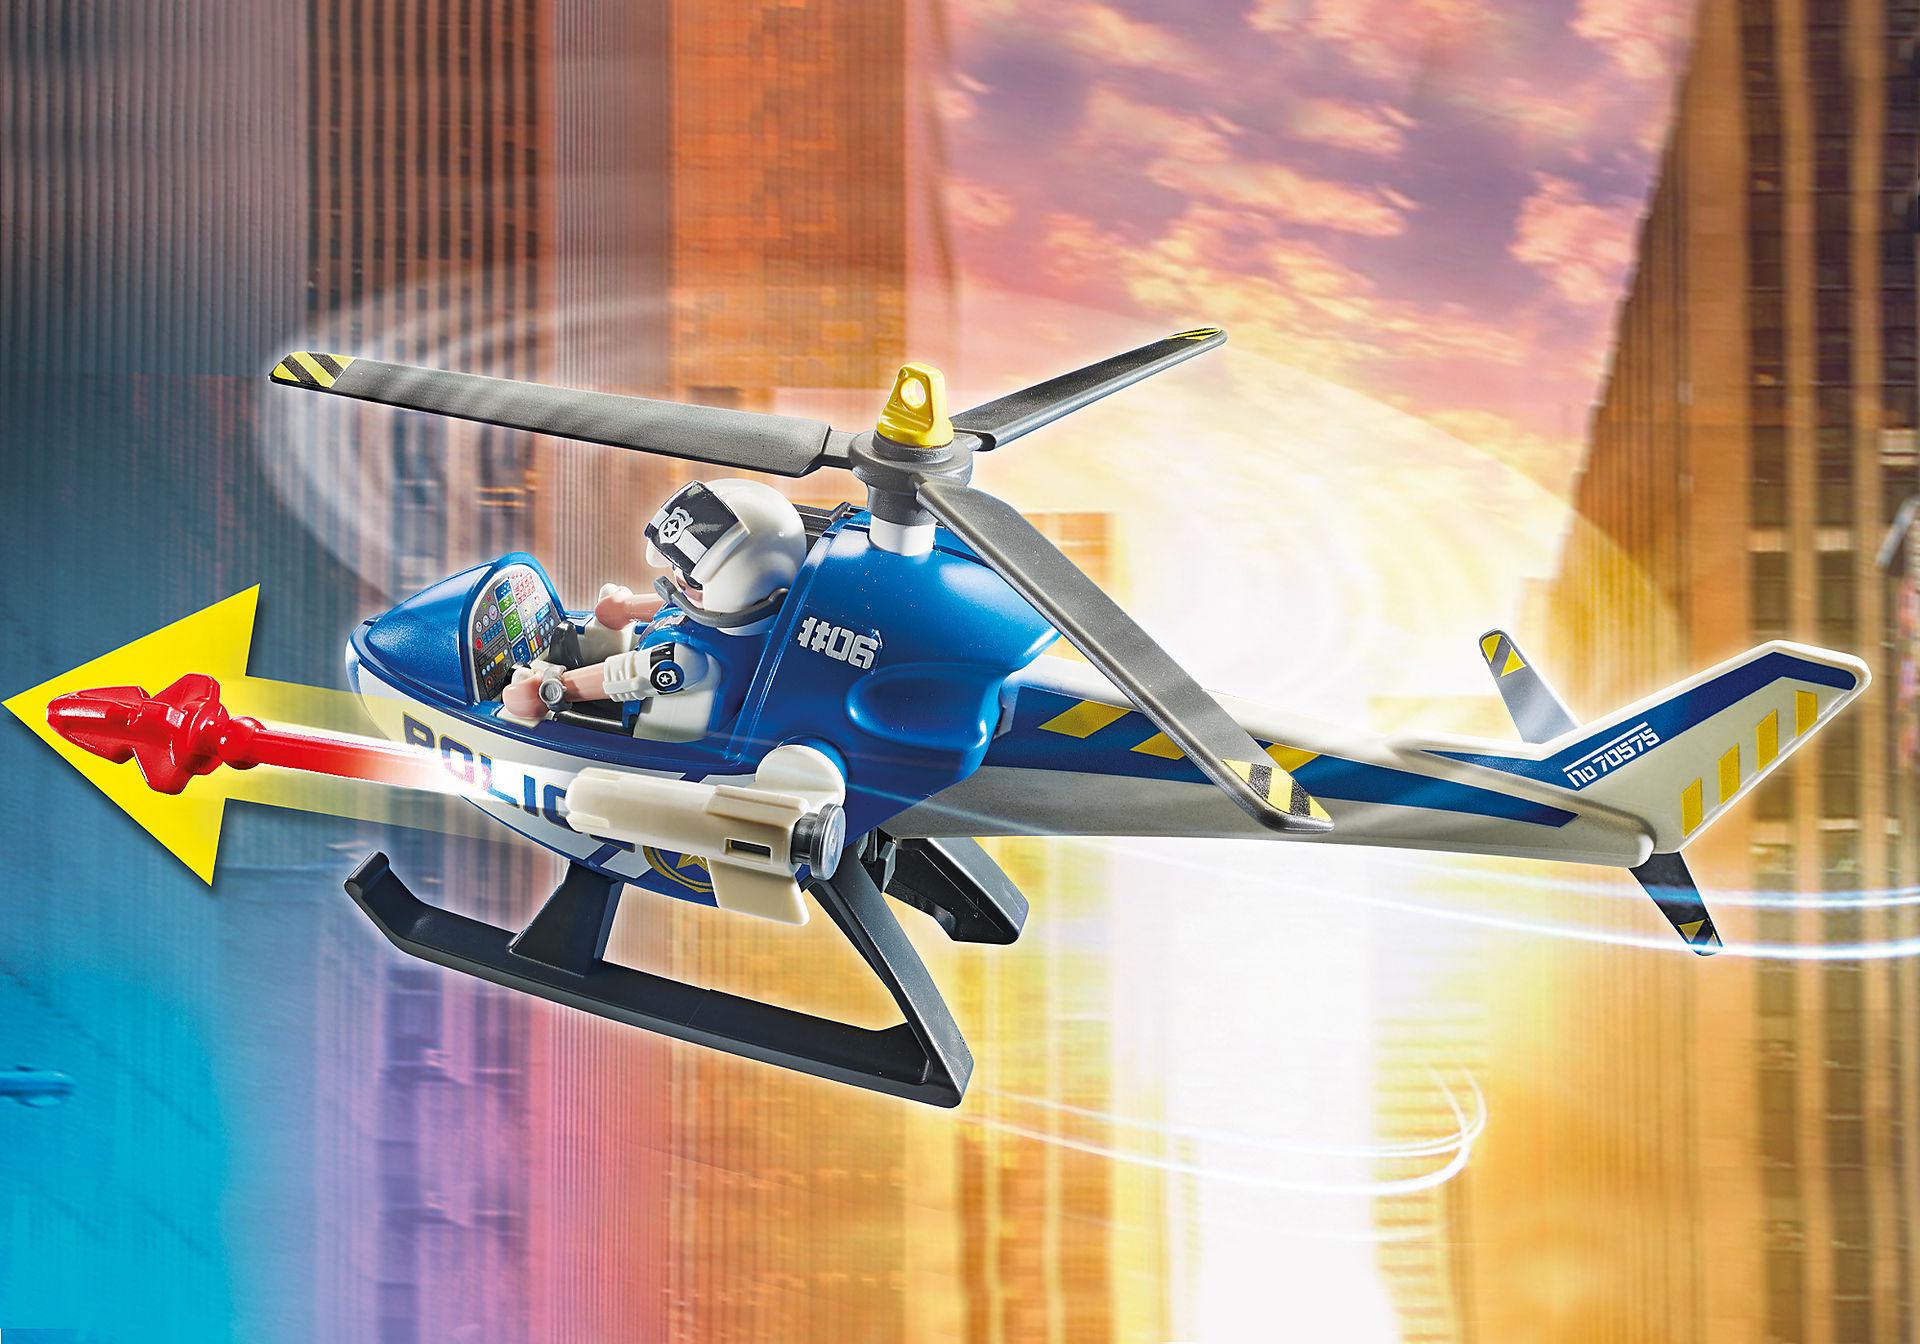 70575 Helicopter Pursuit with Runaway Van zoom image4